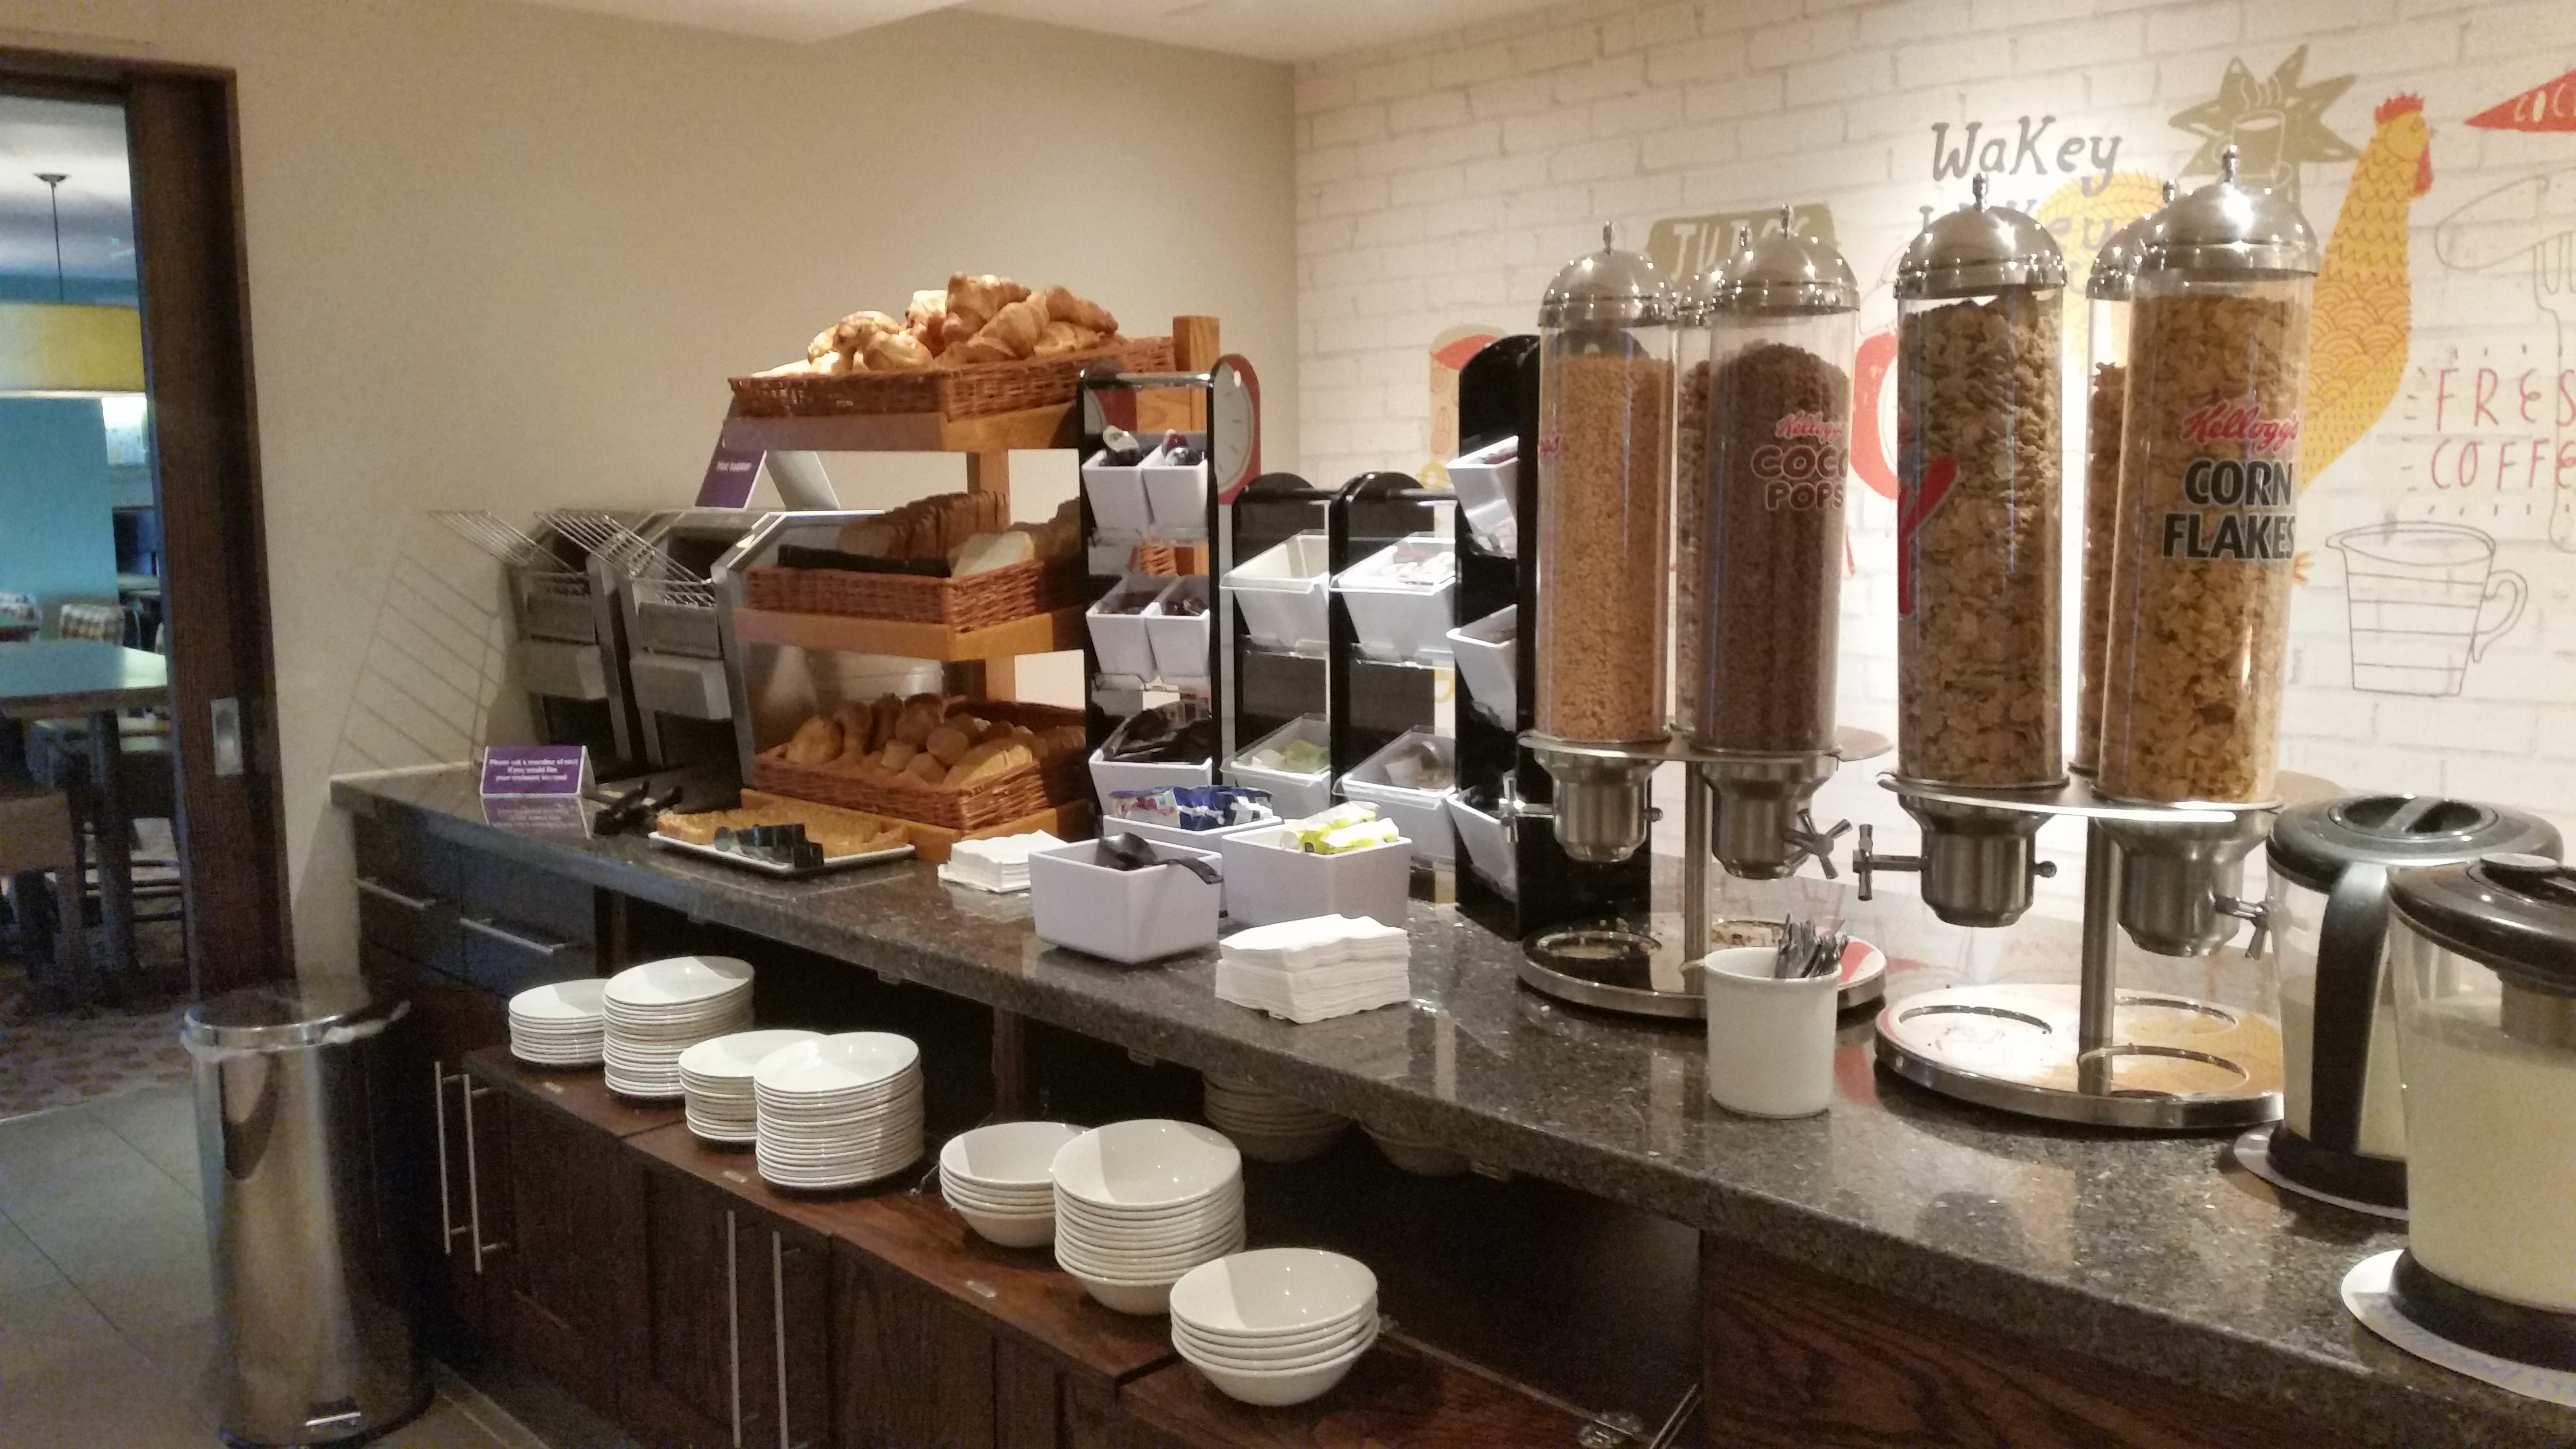 Archway Premier Inn Continental Breakfast